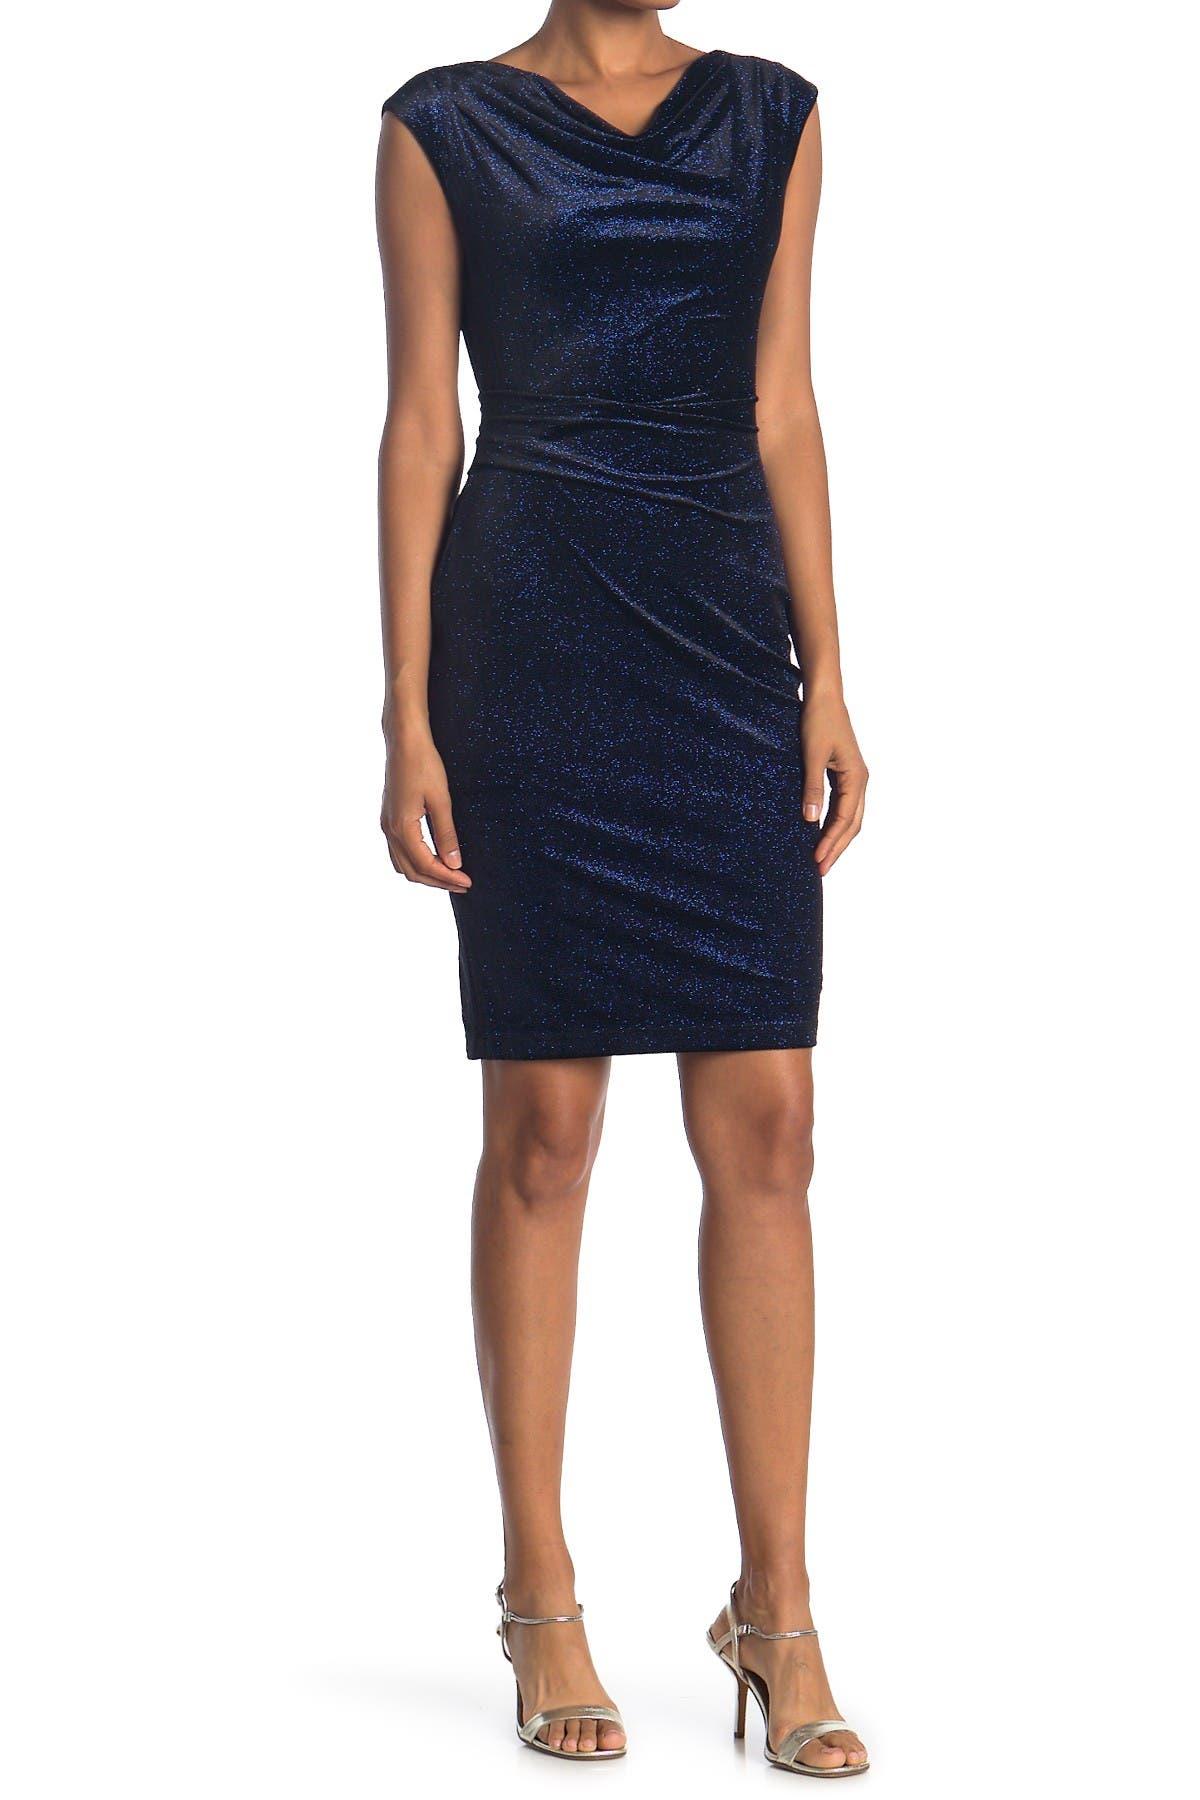 Image of Eliza J Velvet Cap Sleeve Sheath Dress